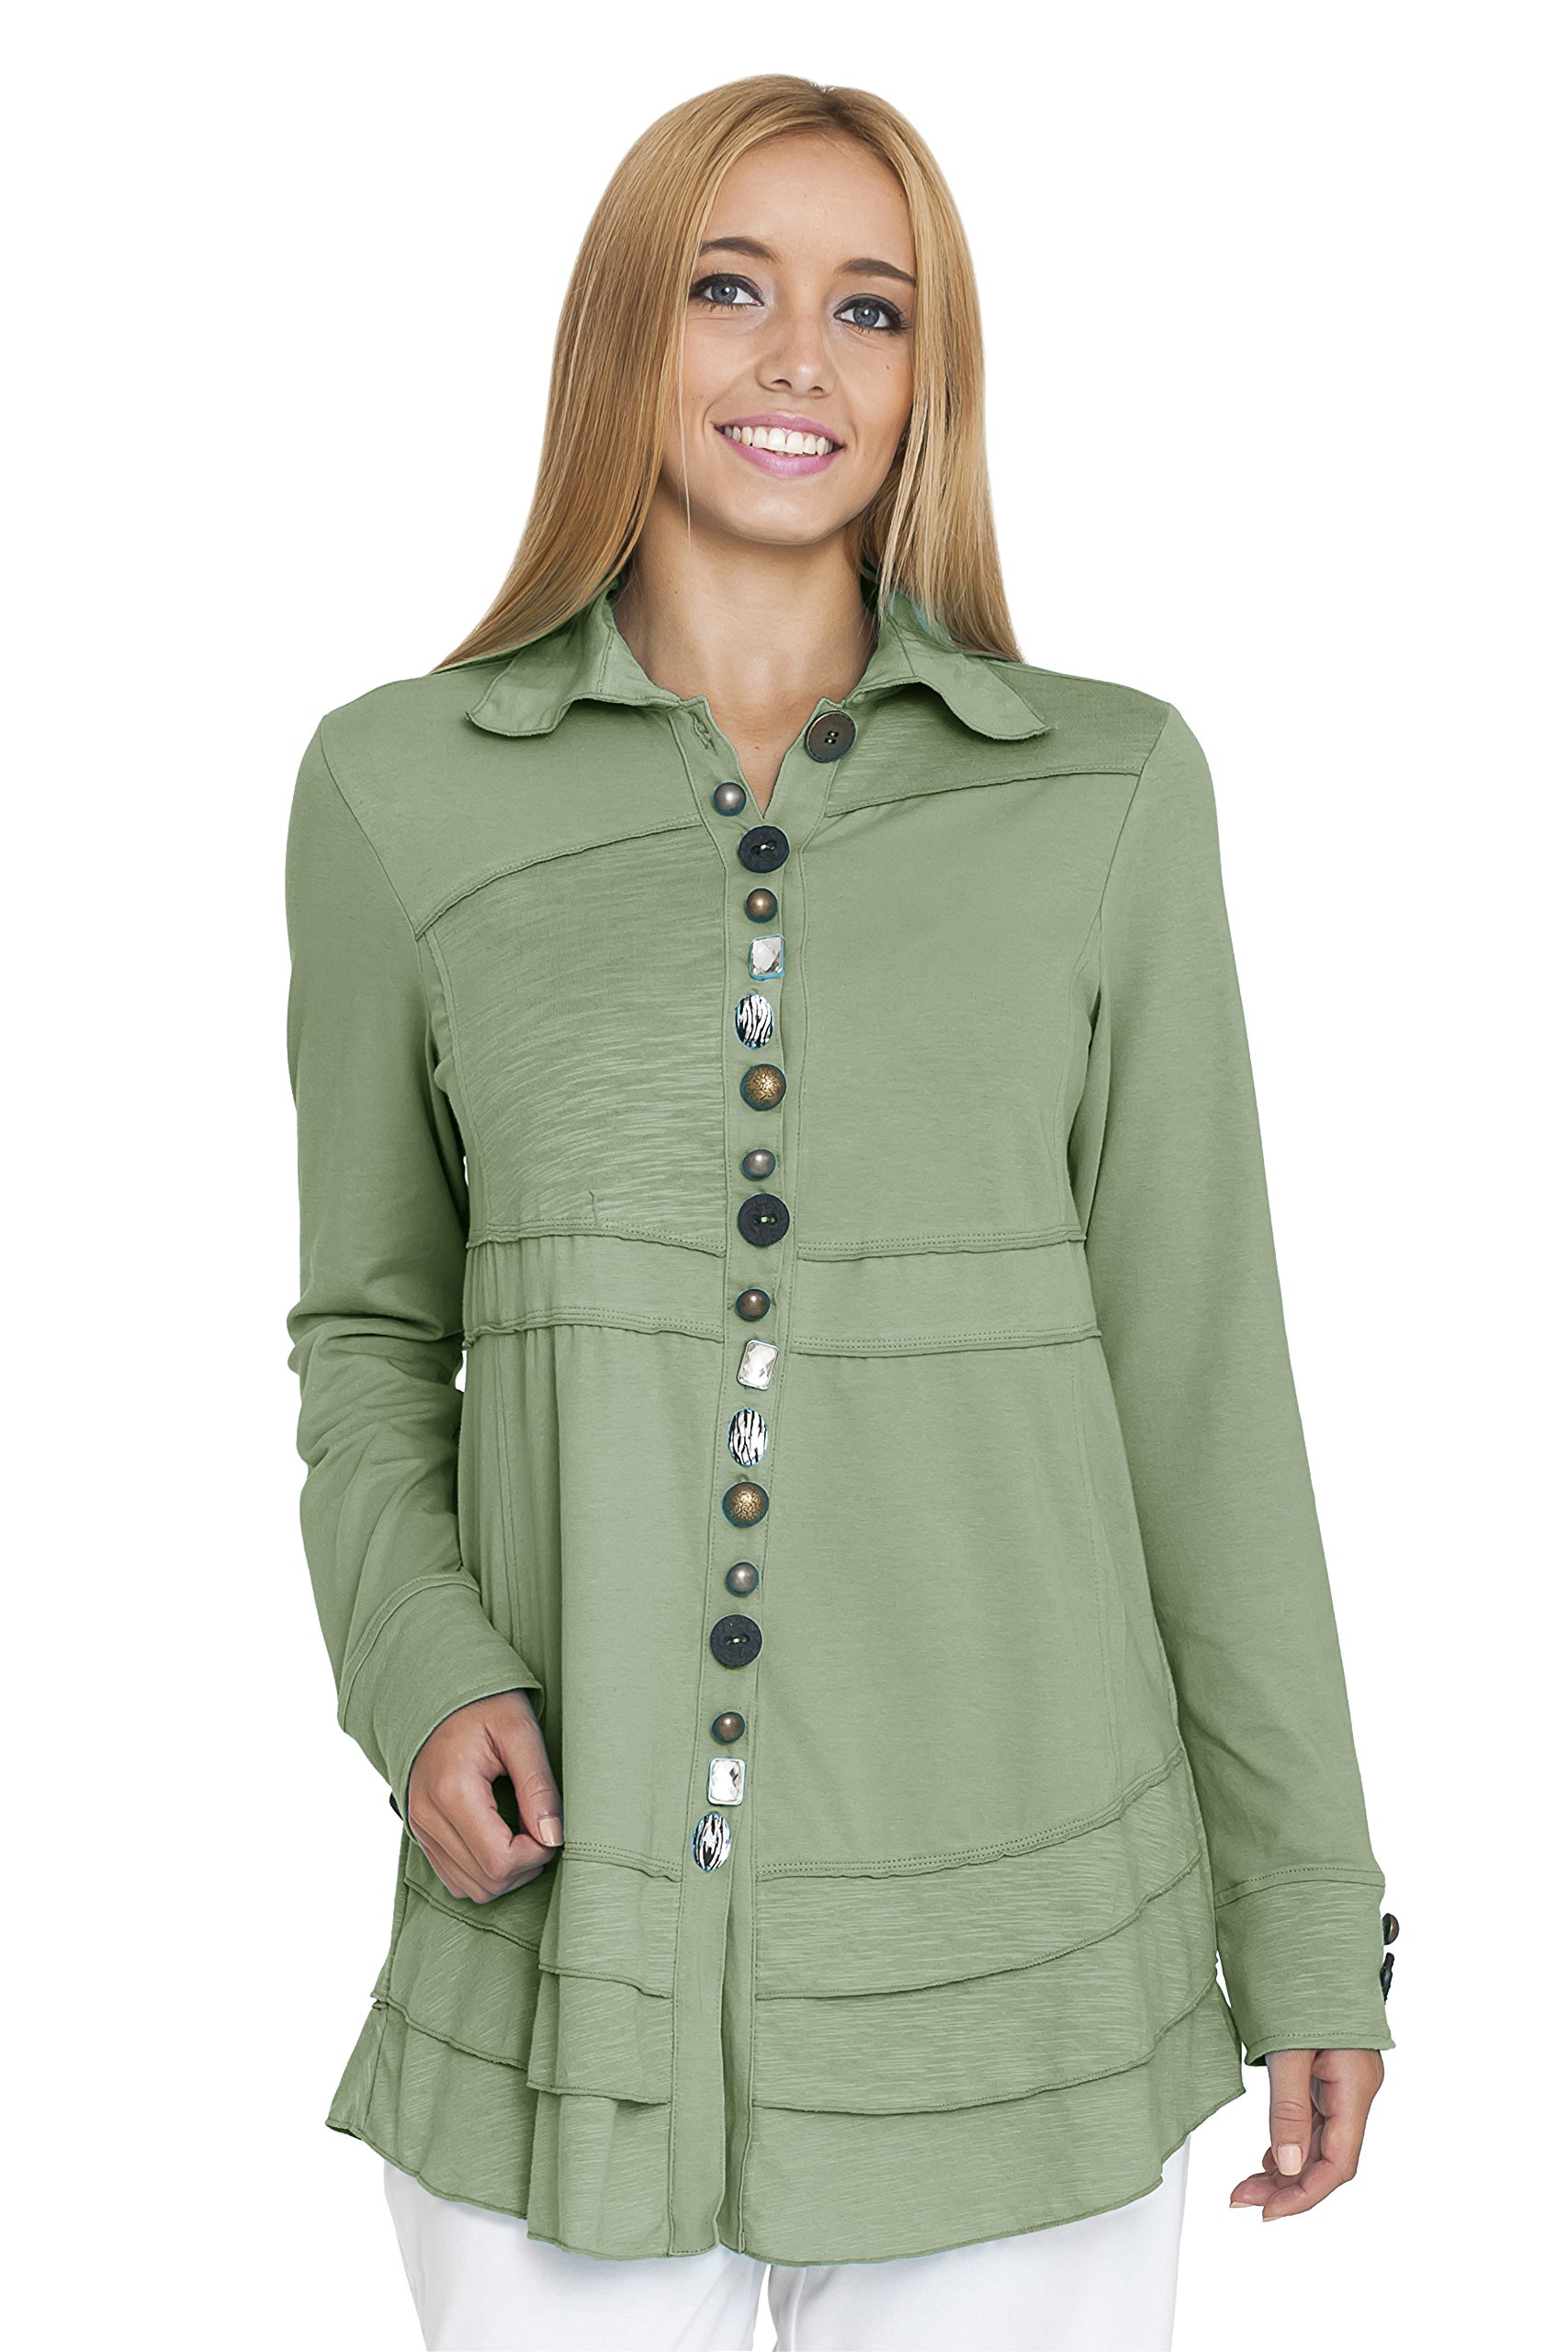 Neon Buddha Women's Sage Shirt, Recycled Sage, Small by Neon Buddha